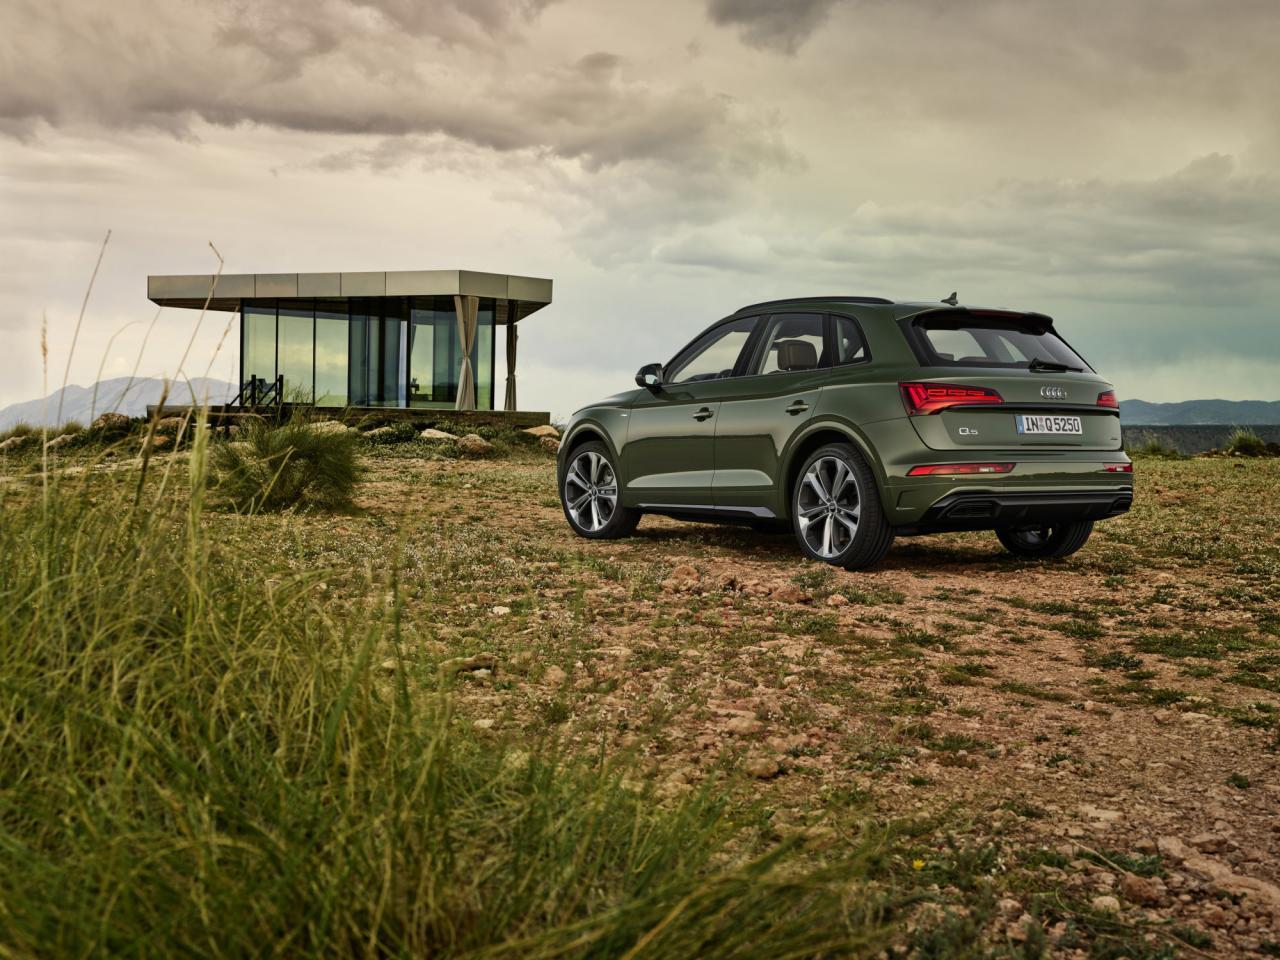 2020 Audi Q5 Specs and Details